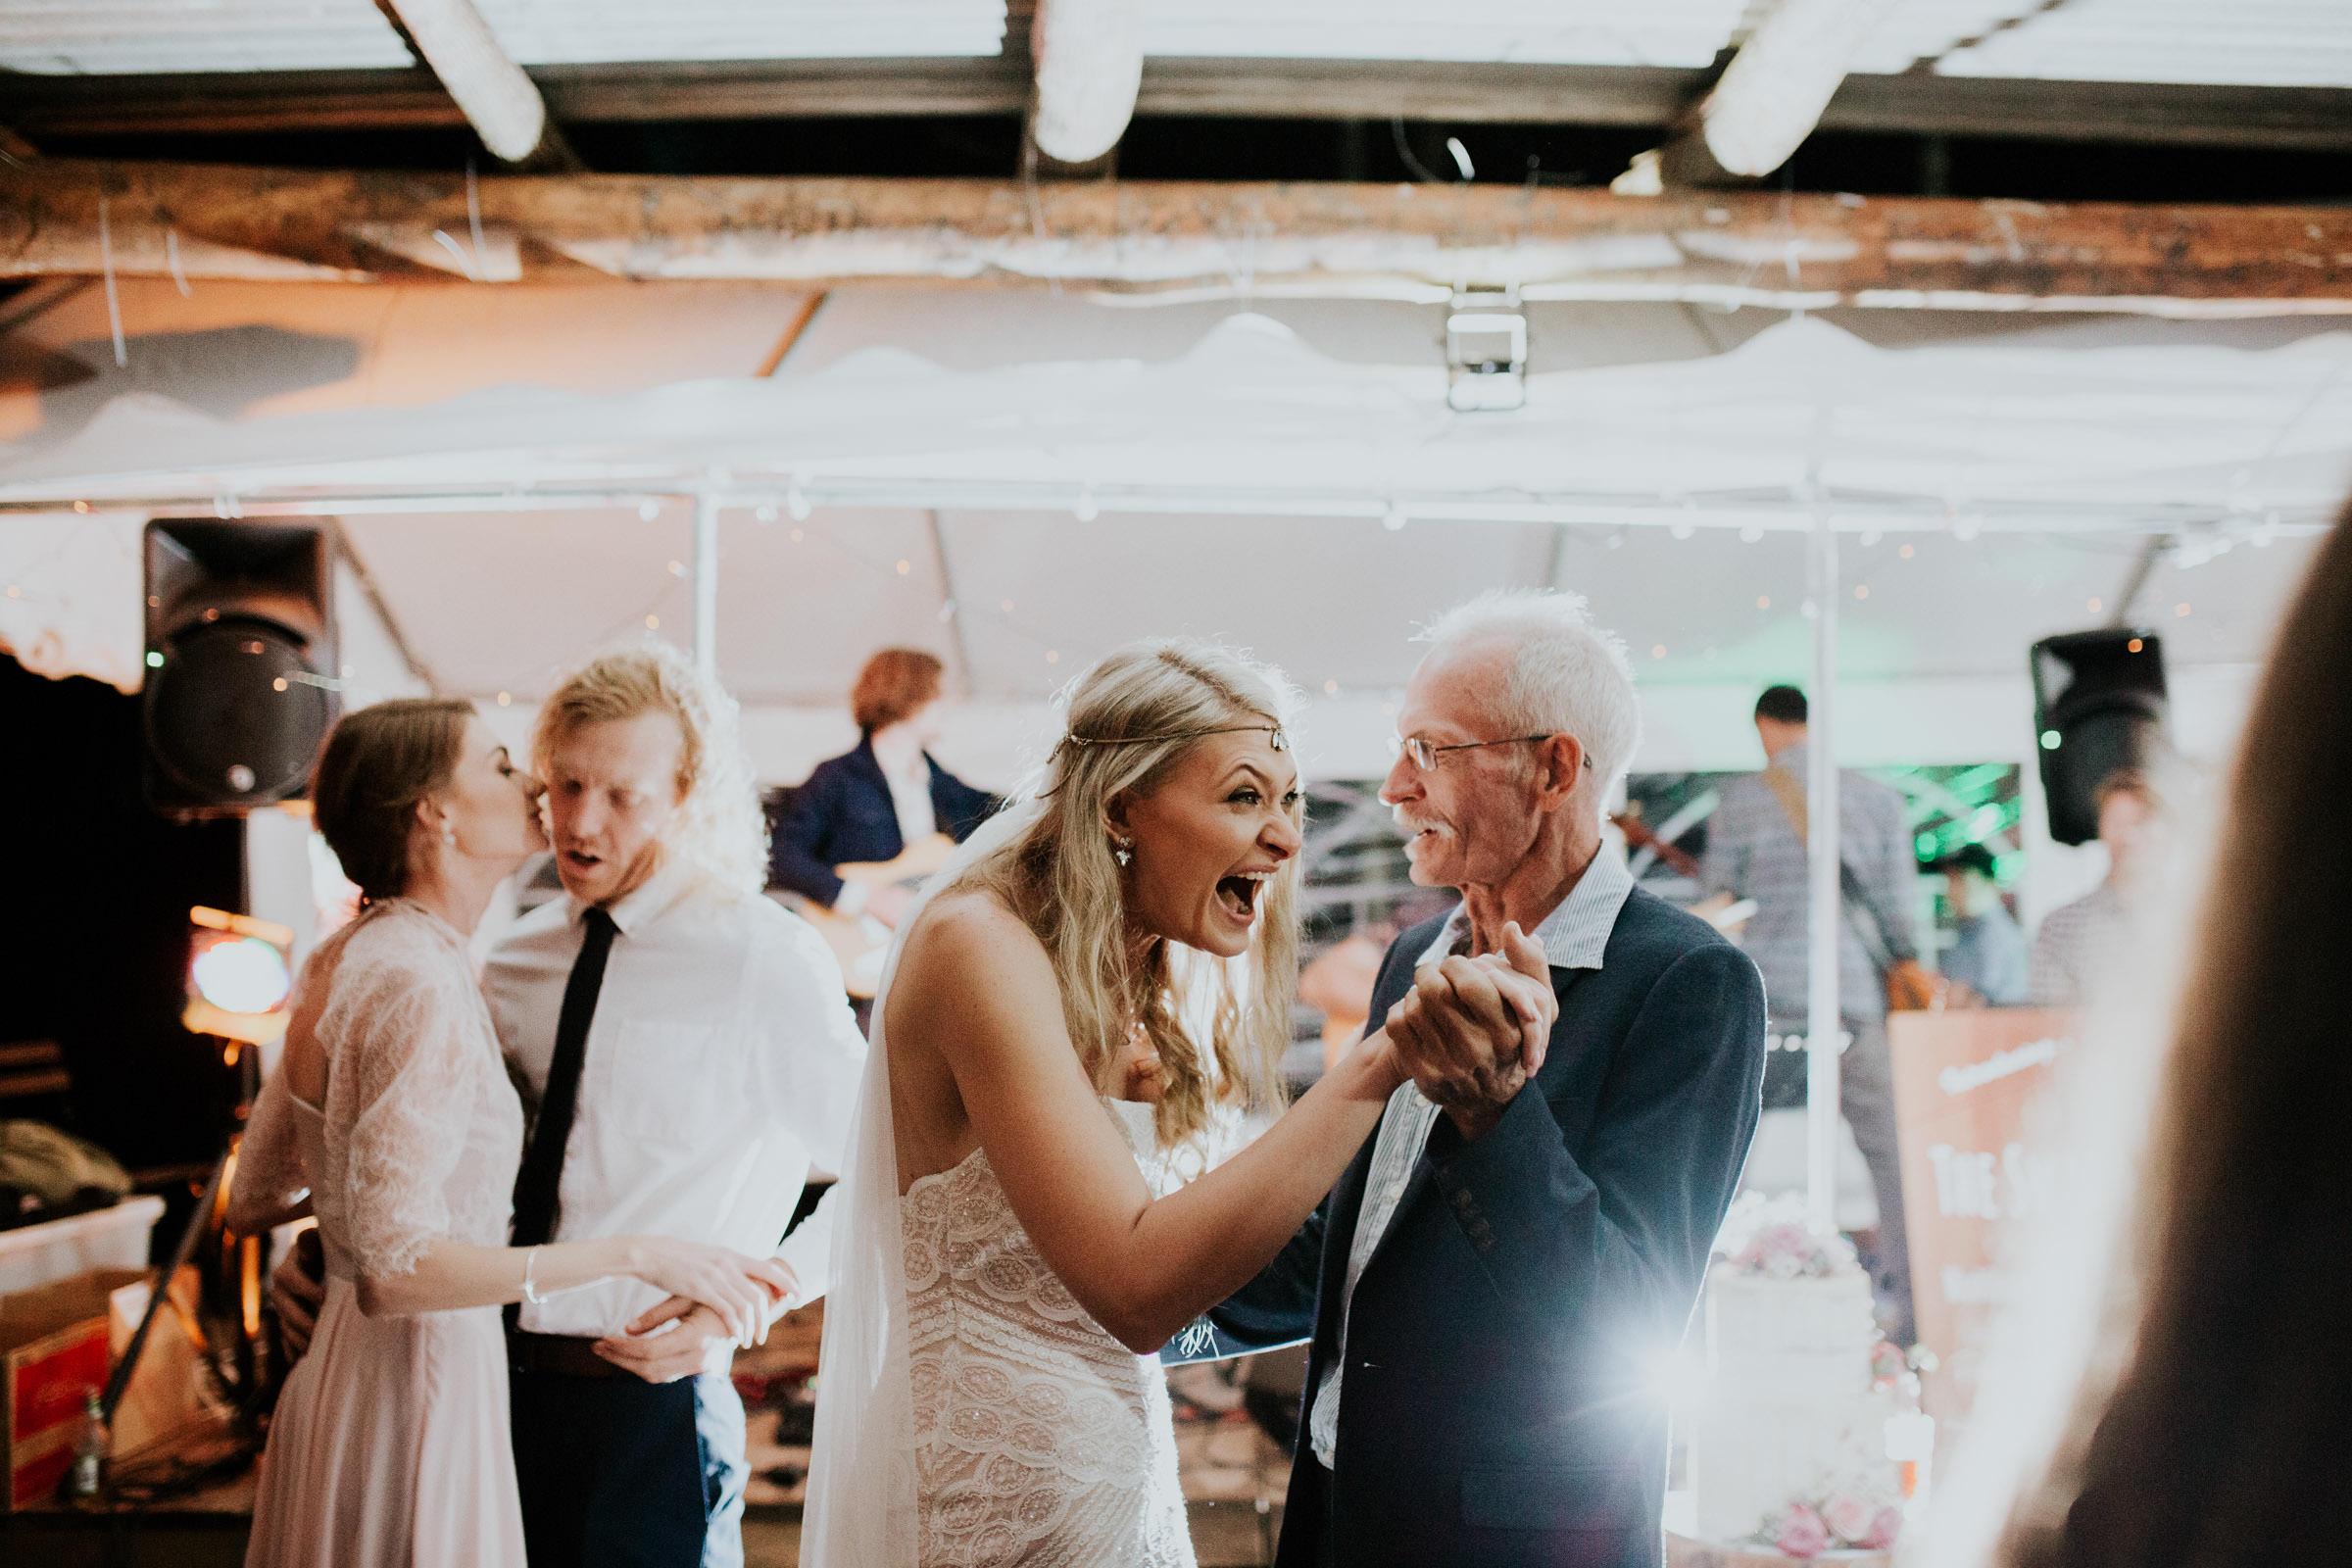 Emma+John+Far+South+Coast+Wedding+Festivl+Glamping+Bush-163.jpg